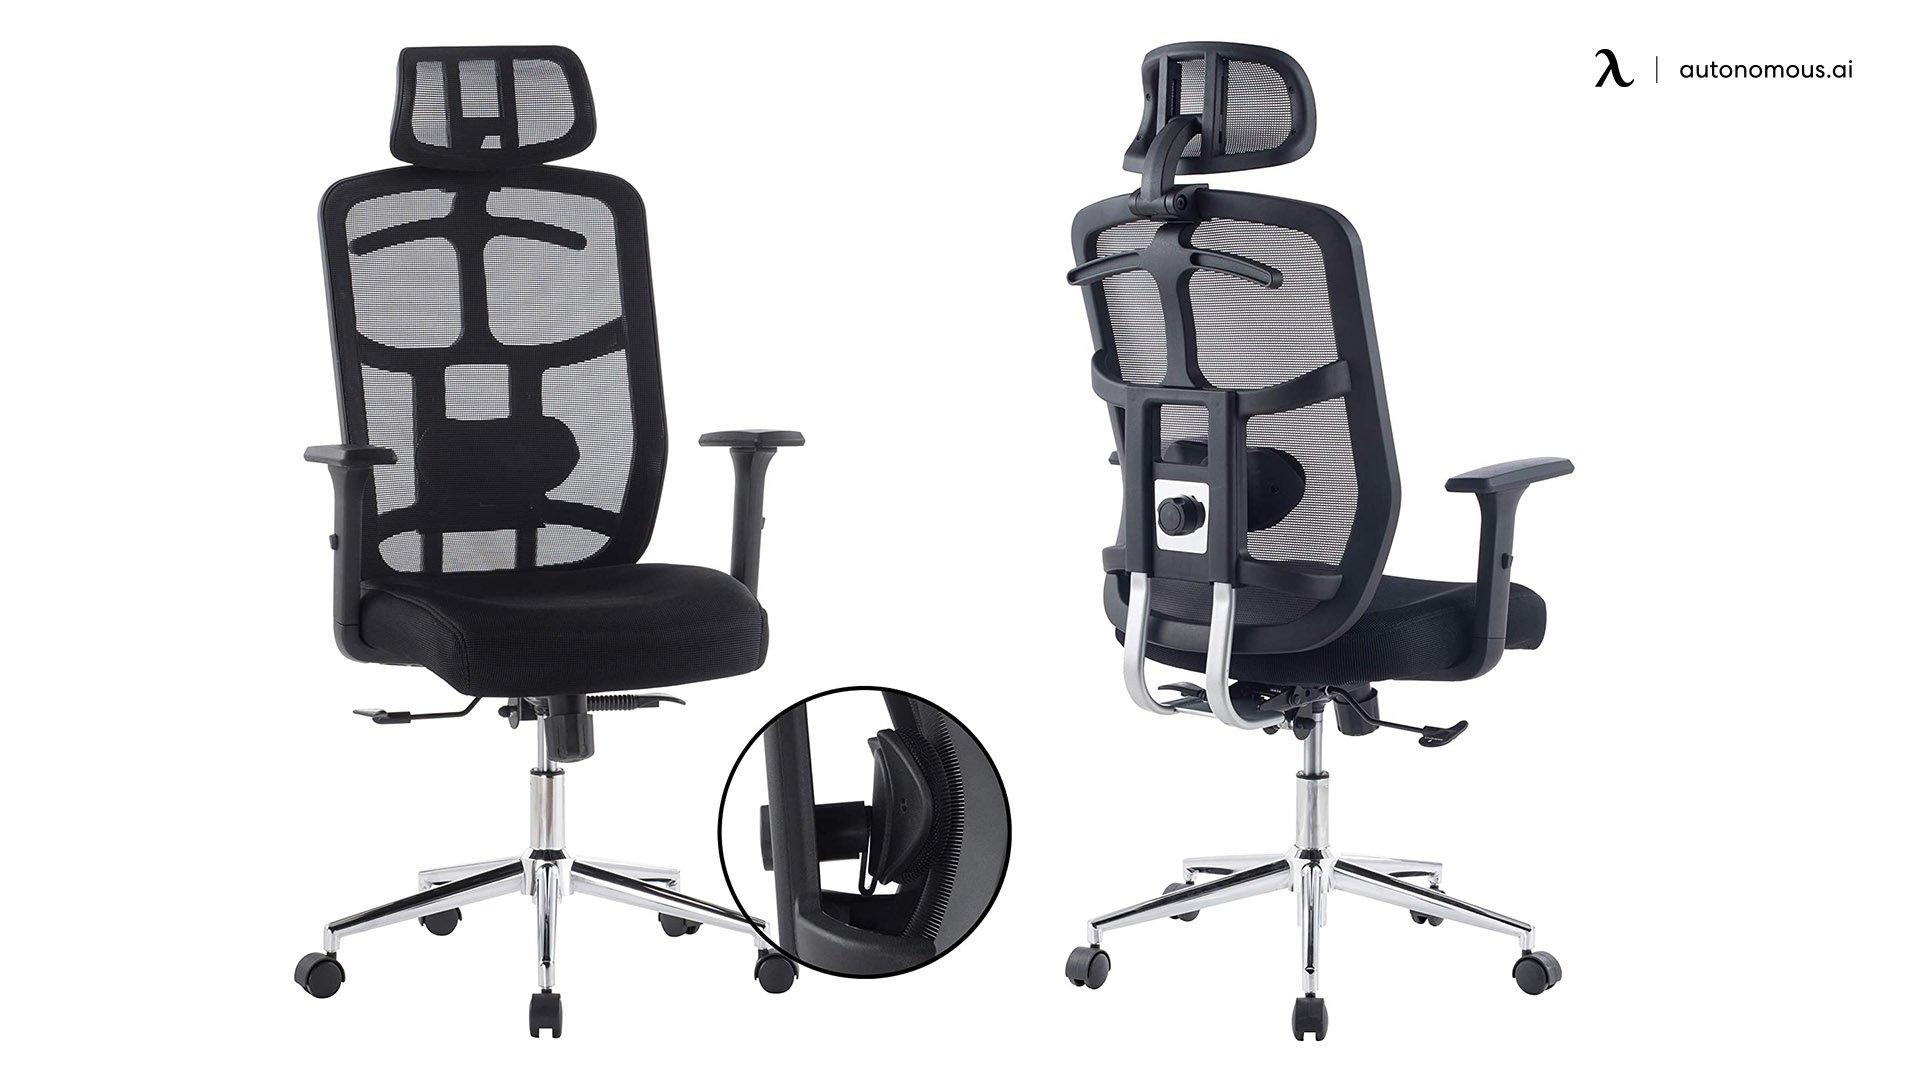 MotionGrey – Stylish Ergonomic Office Chair